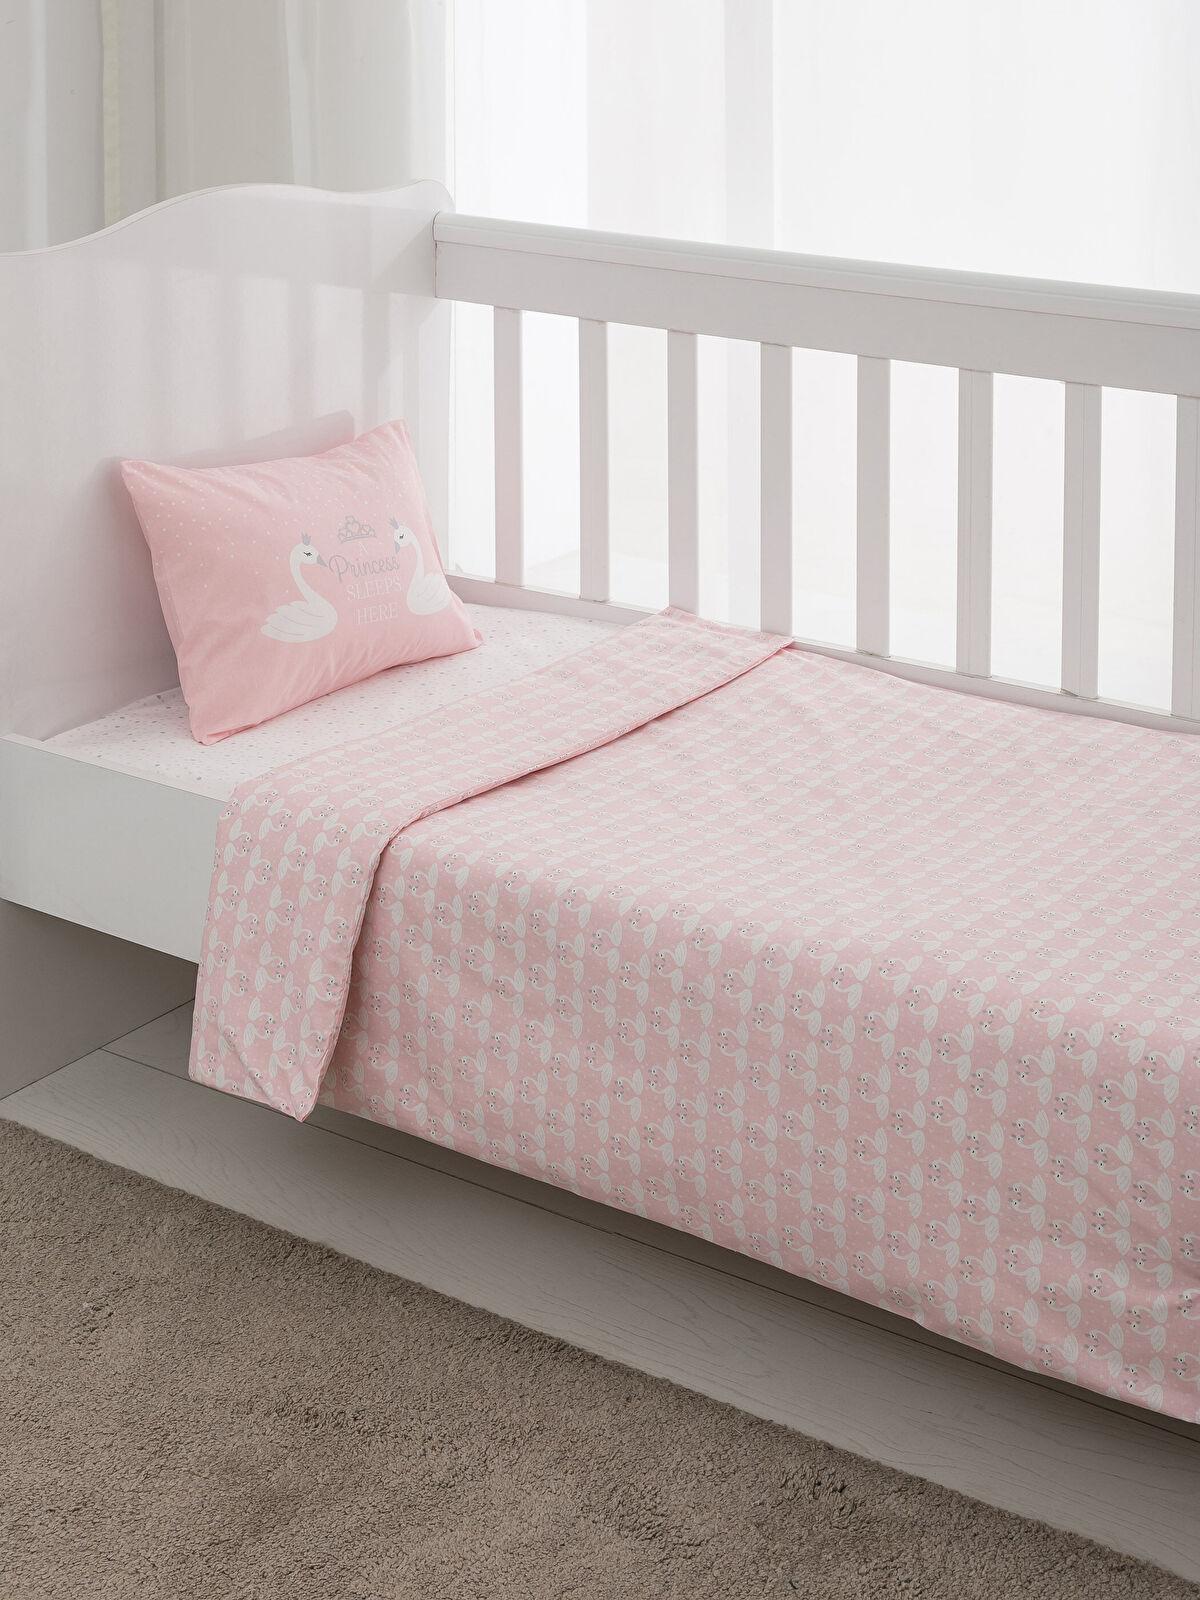 Bebek Pamuklu Nevresim Takımı - LCW HOME